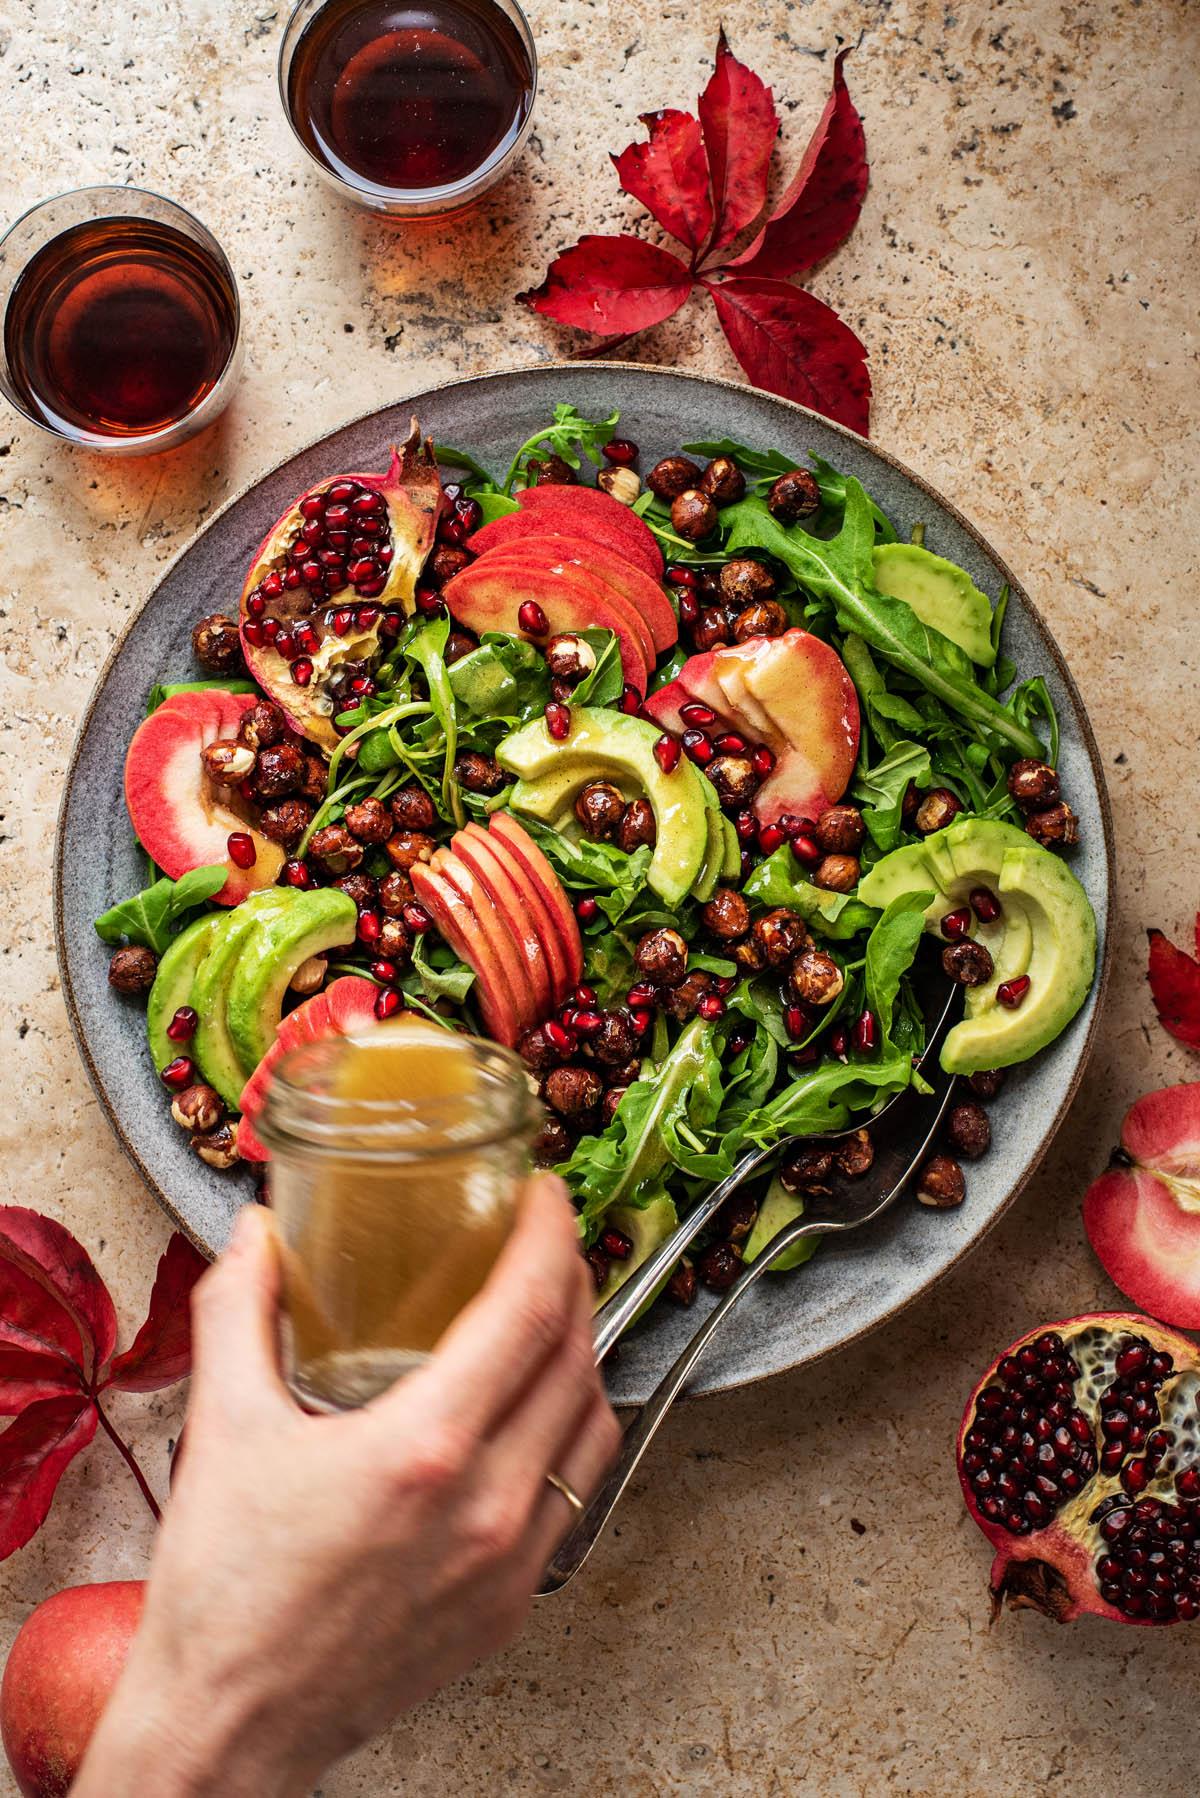 Pouring vinaigrette over an apple salad.